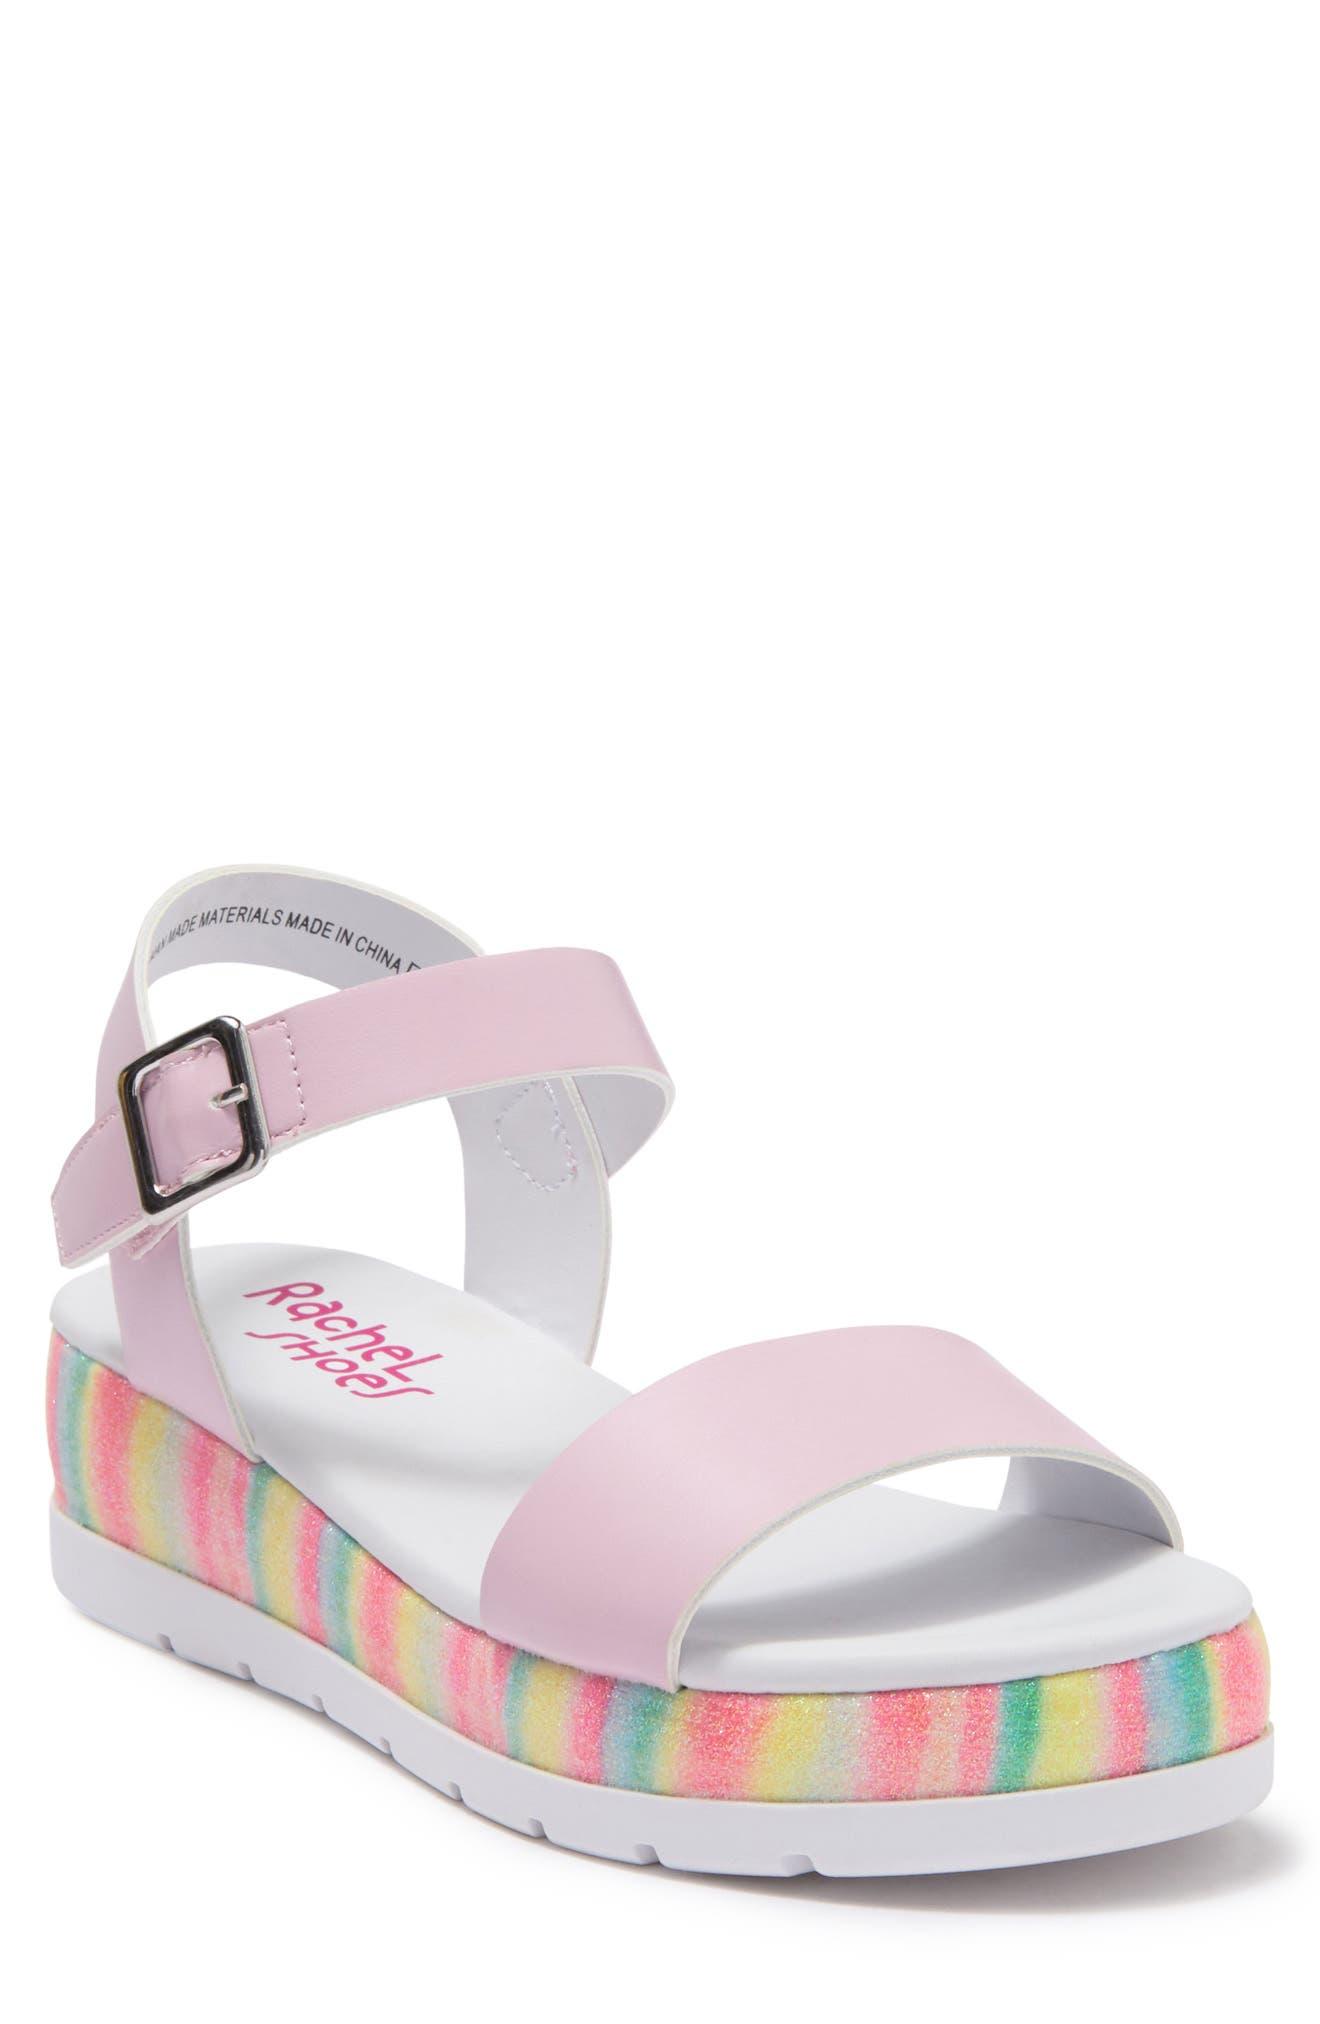 Image of Rachel Shoes Flatform Sandal